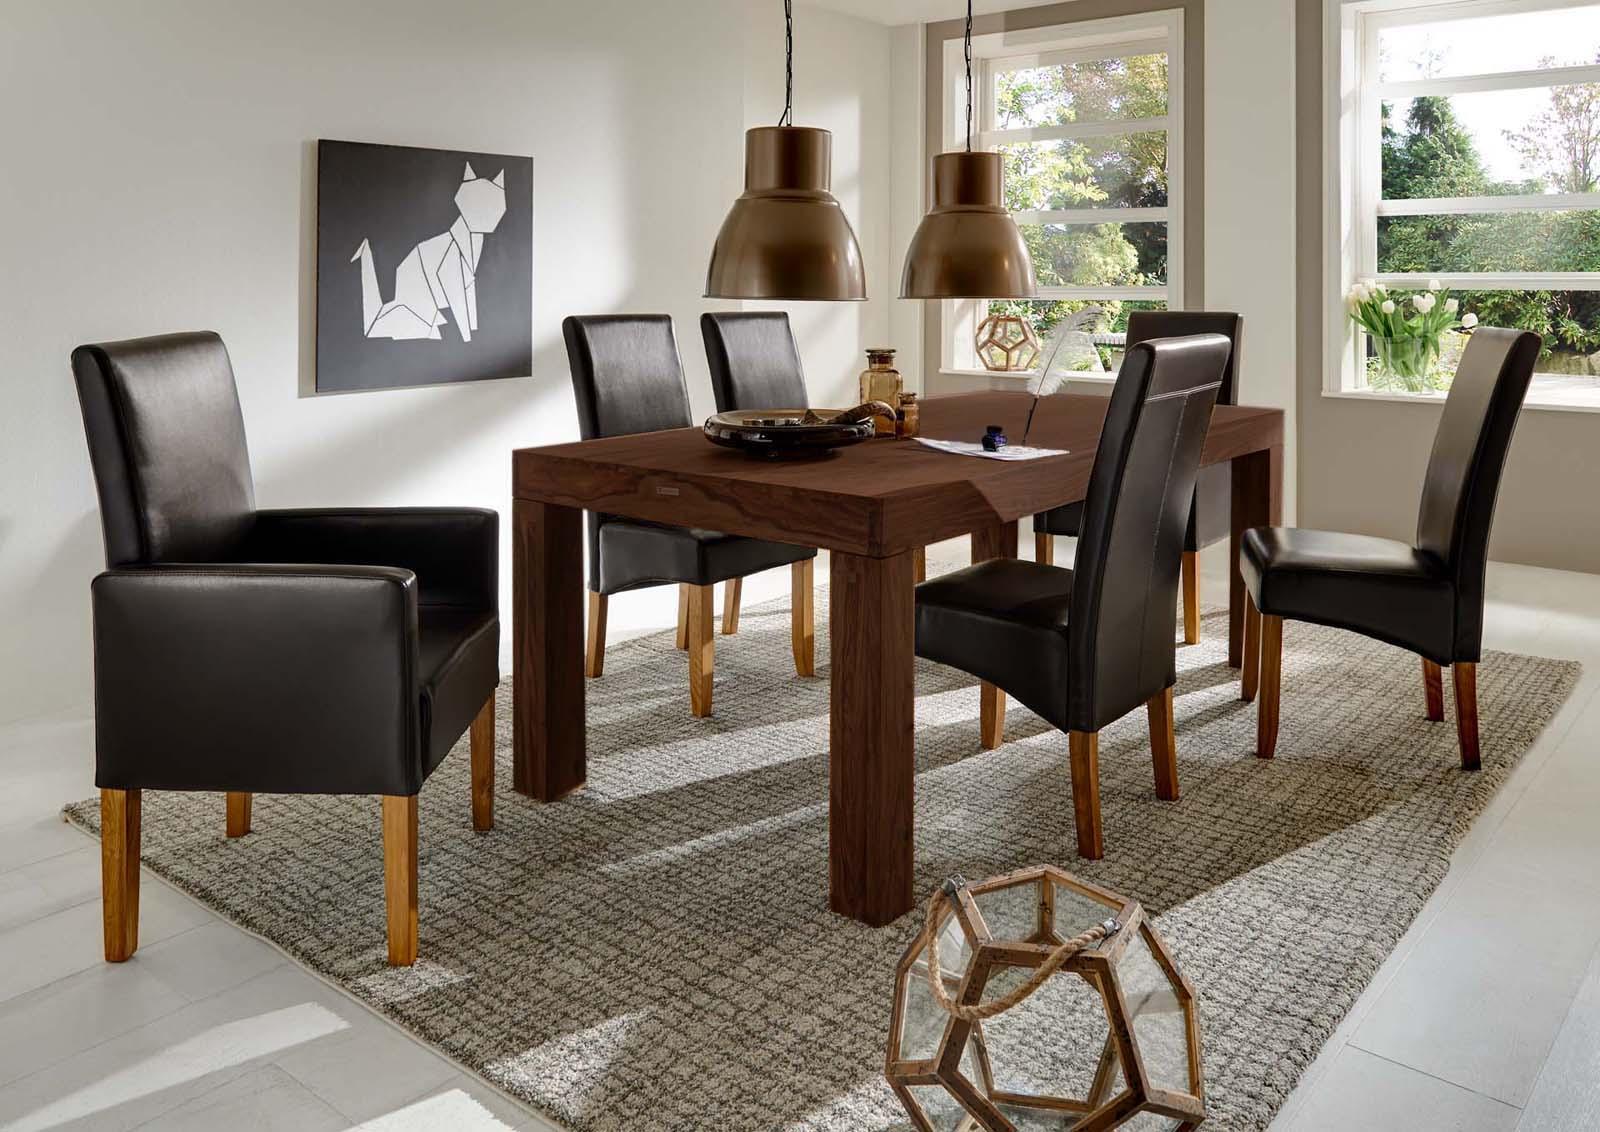 sam sheesham esszimmer tischgruppe 7tlg braun walnuss cubus 180cm. Black Bedroom Furniture Sets. Home Design Ideas